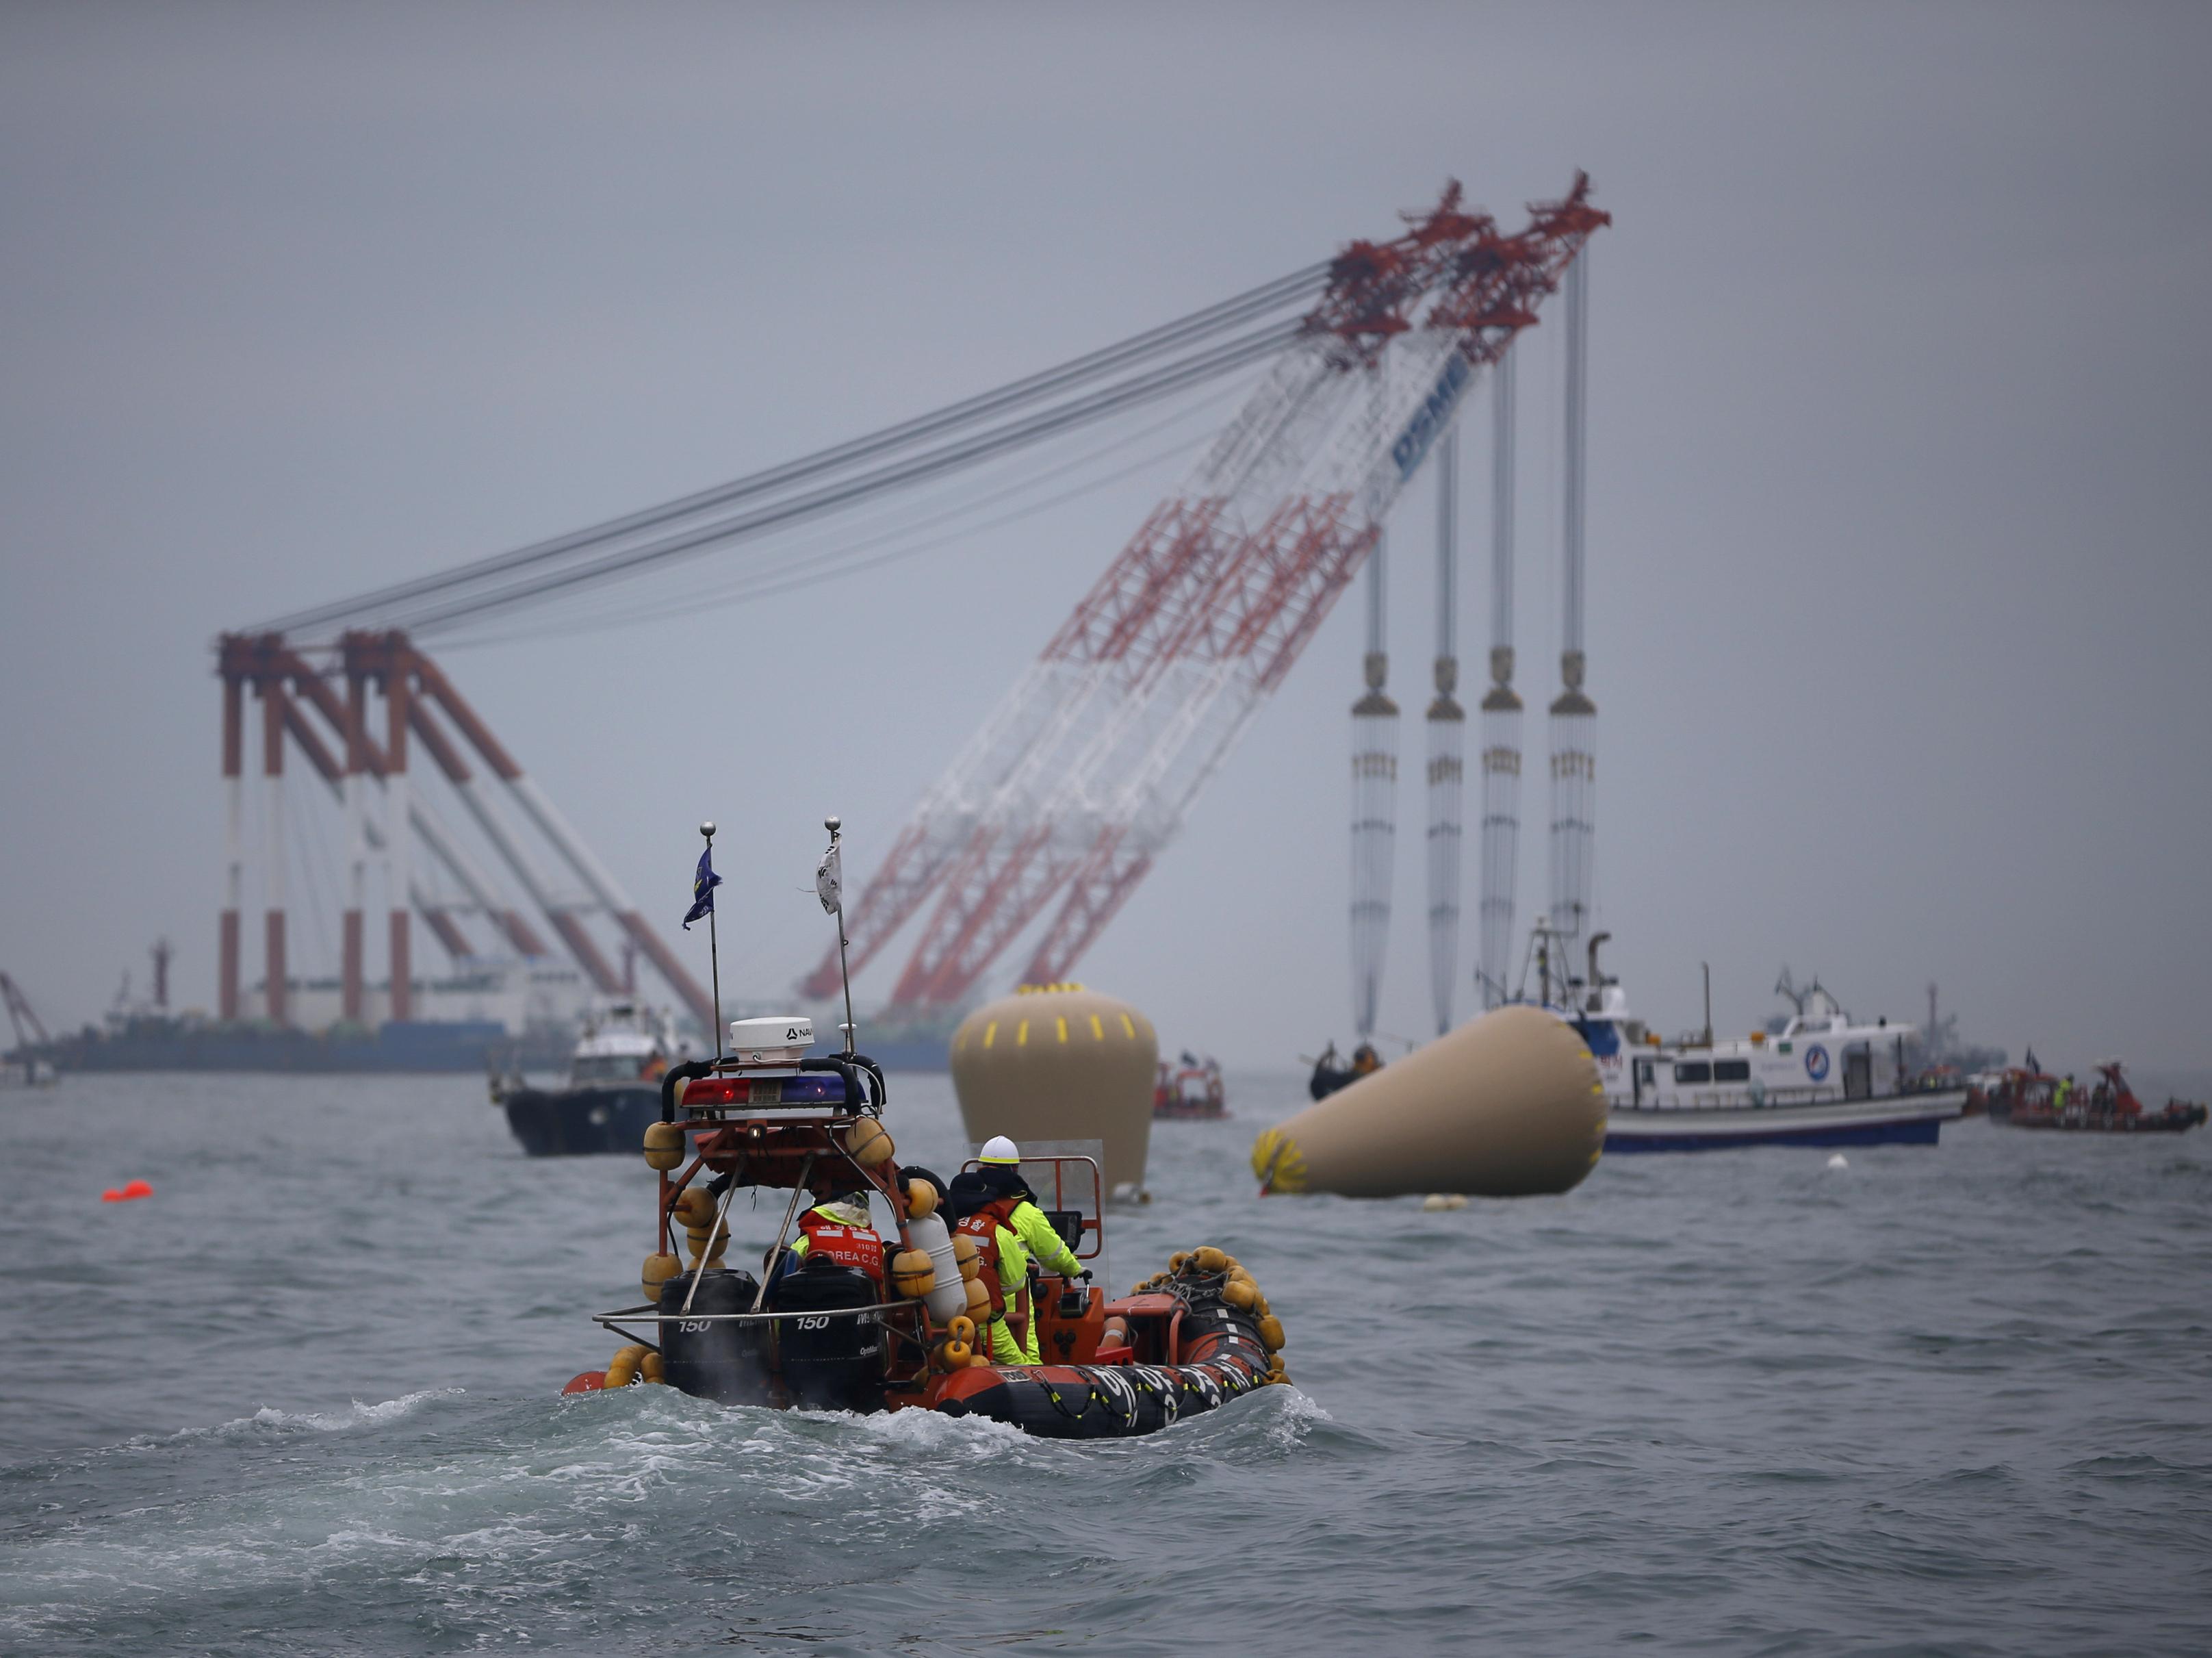 Captain Of Korean Ferry Arrested As Vessel Sinks Below Surface